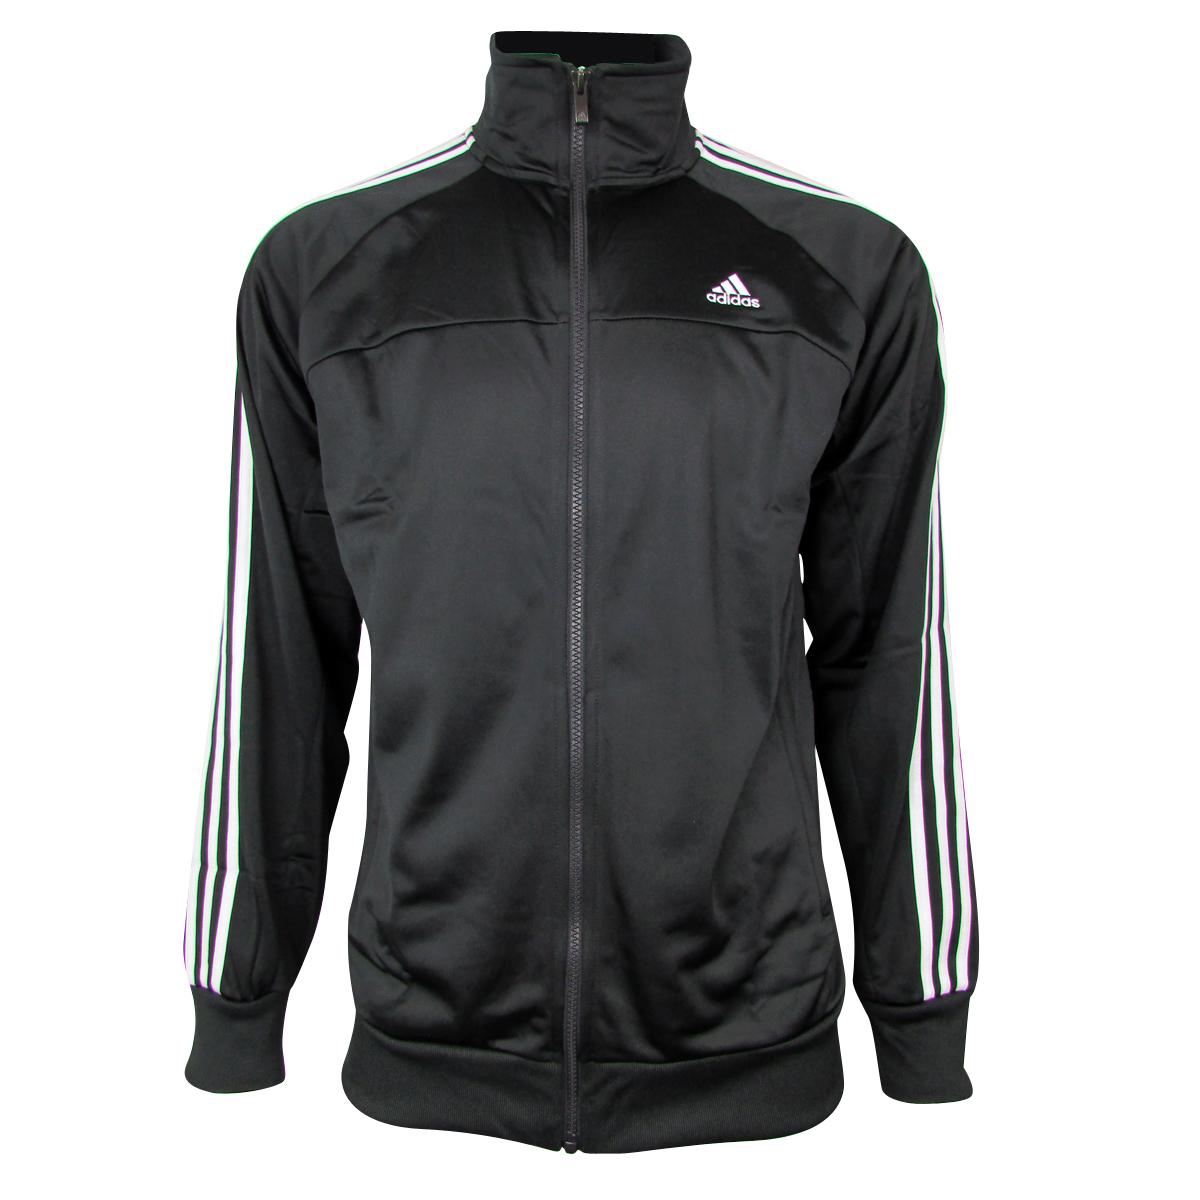 cheap>black adidas jacket white stripes,sport tights,adi ...